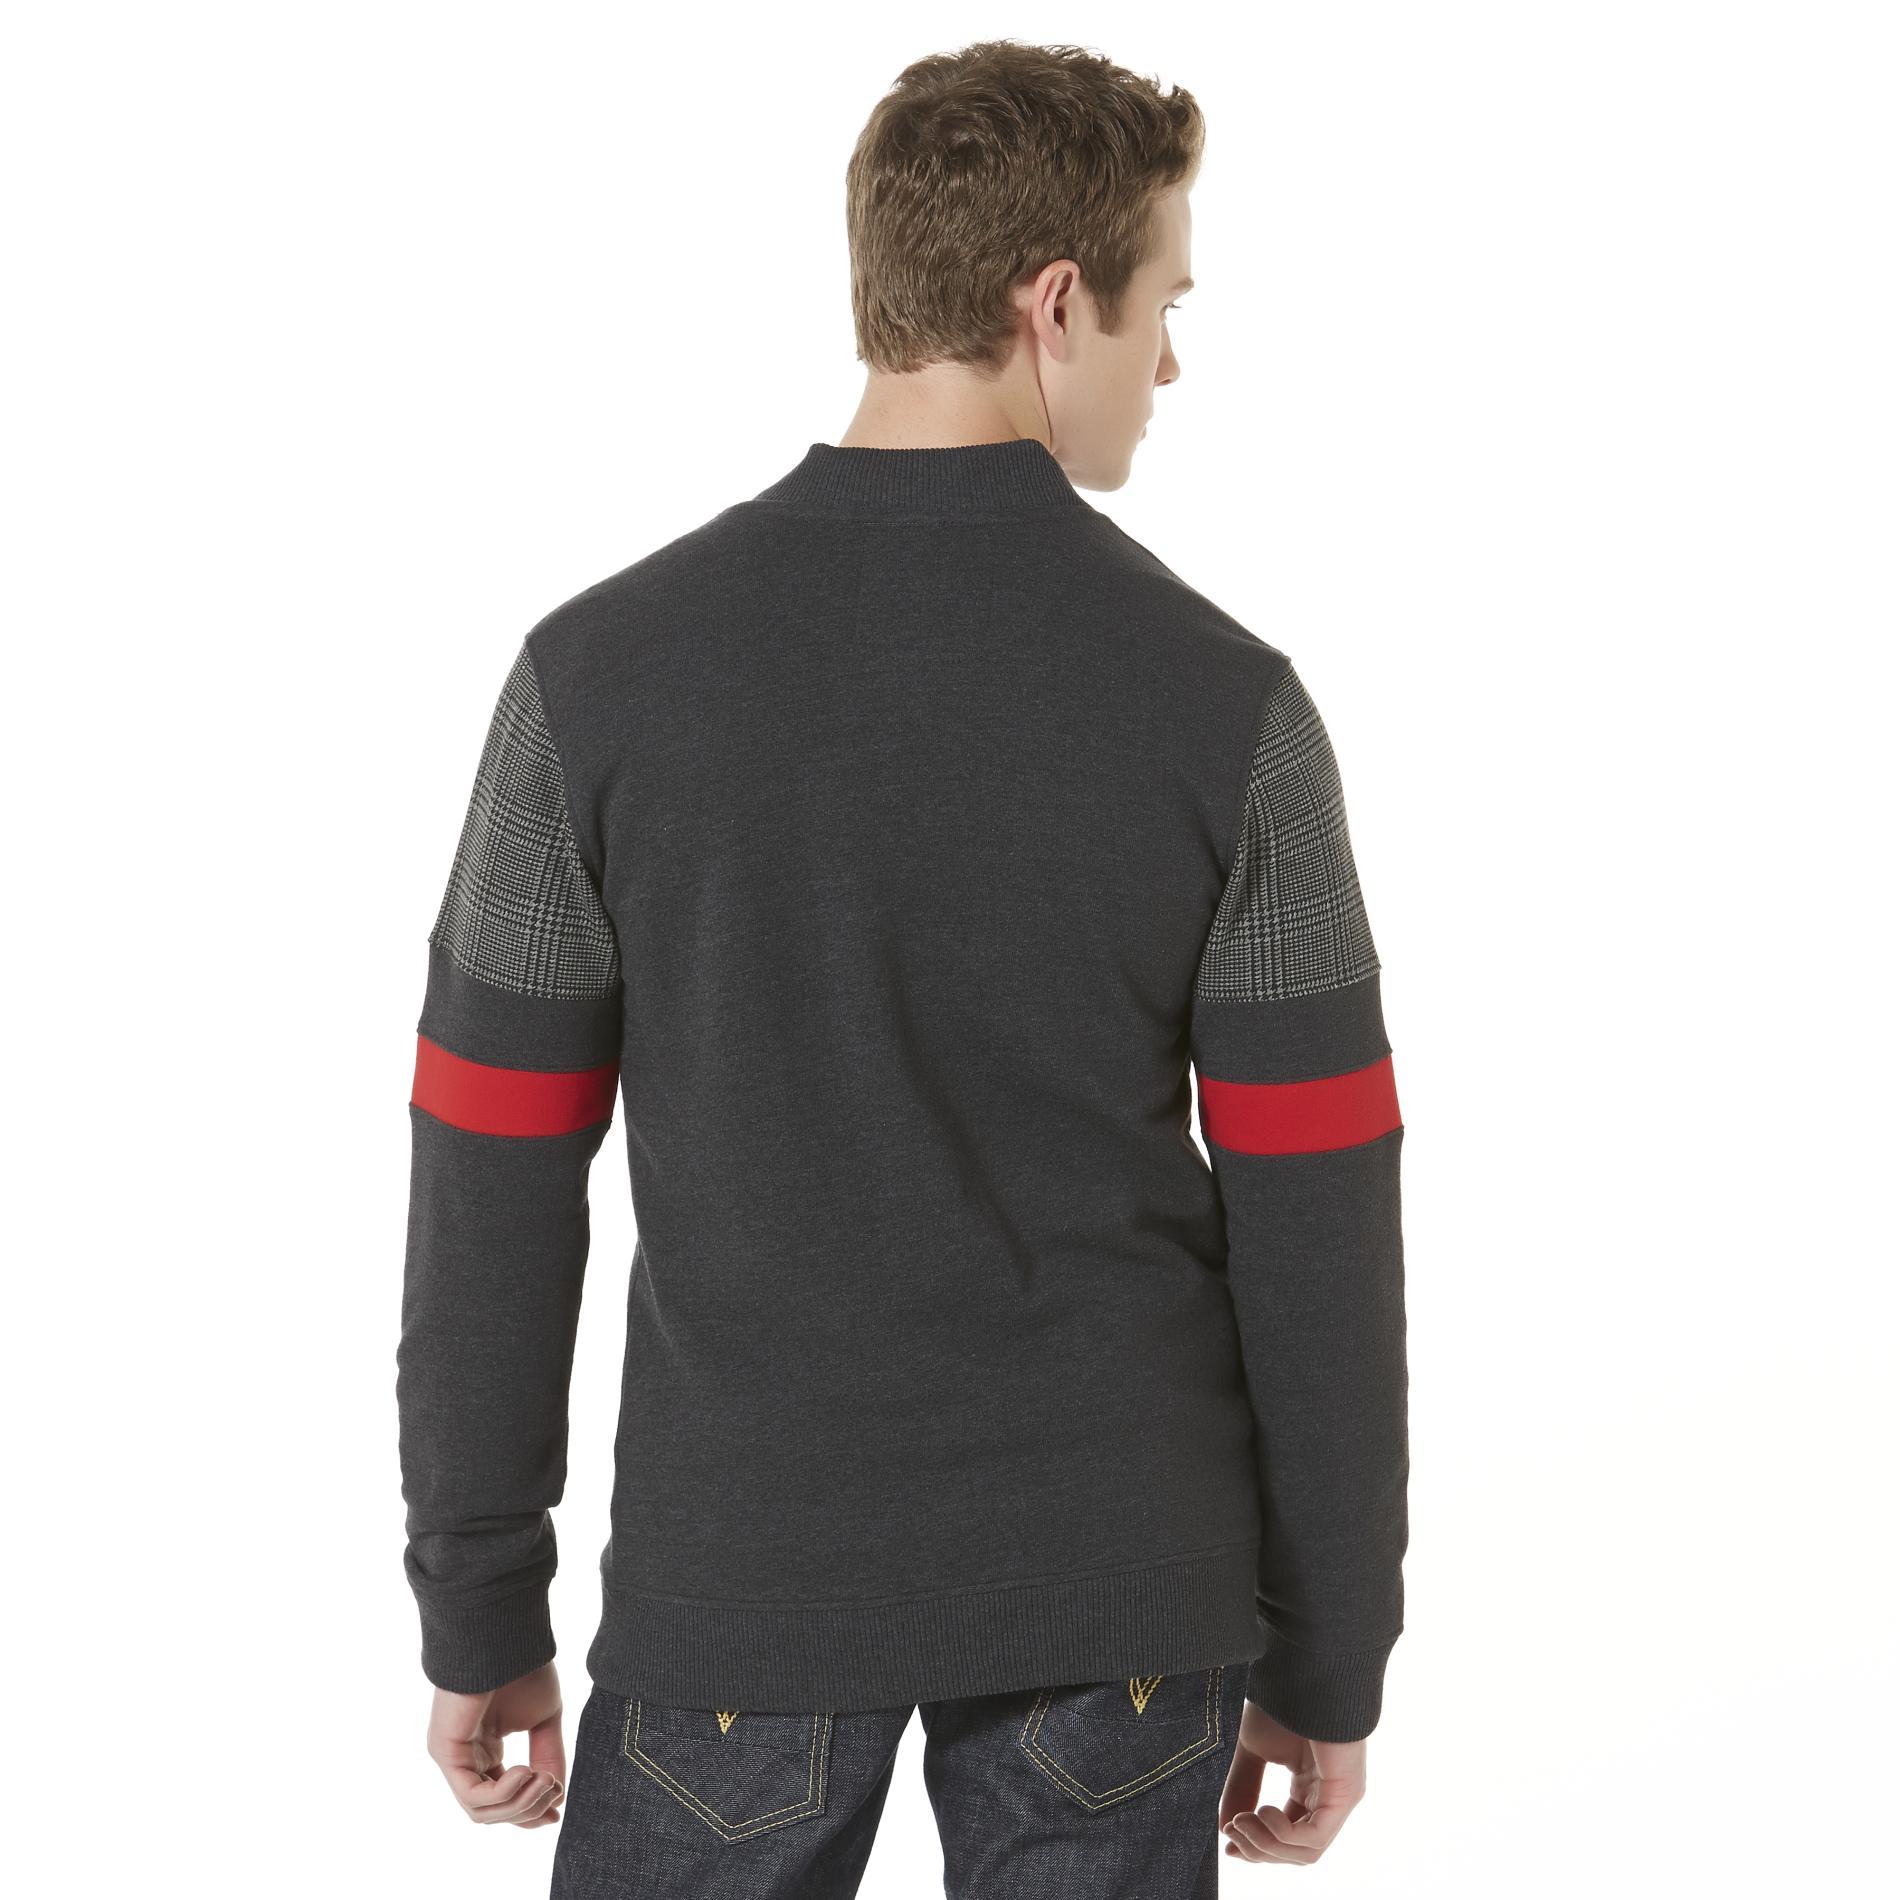 Route 66 Men's Knit Bomber Jacket